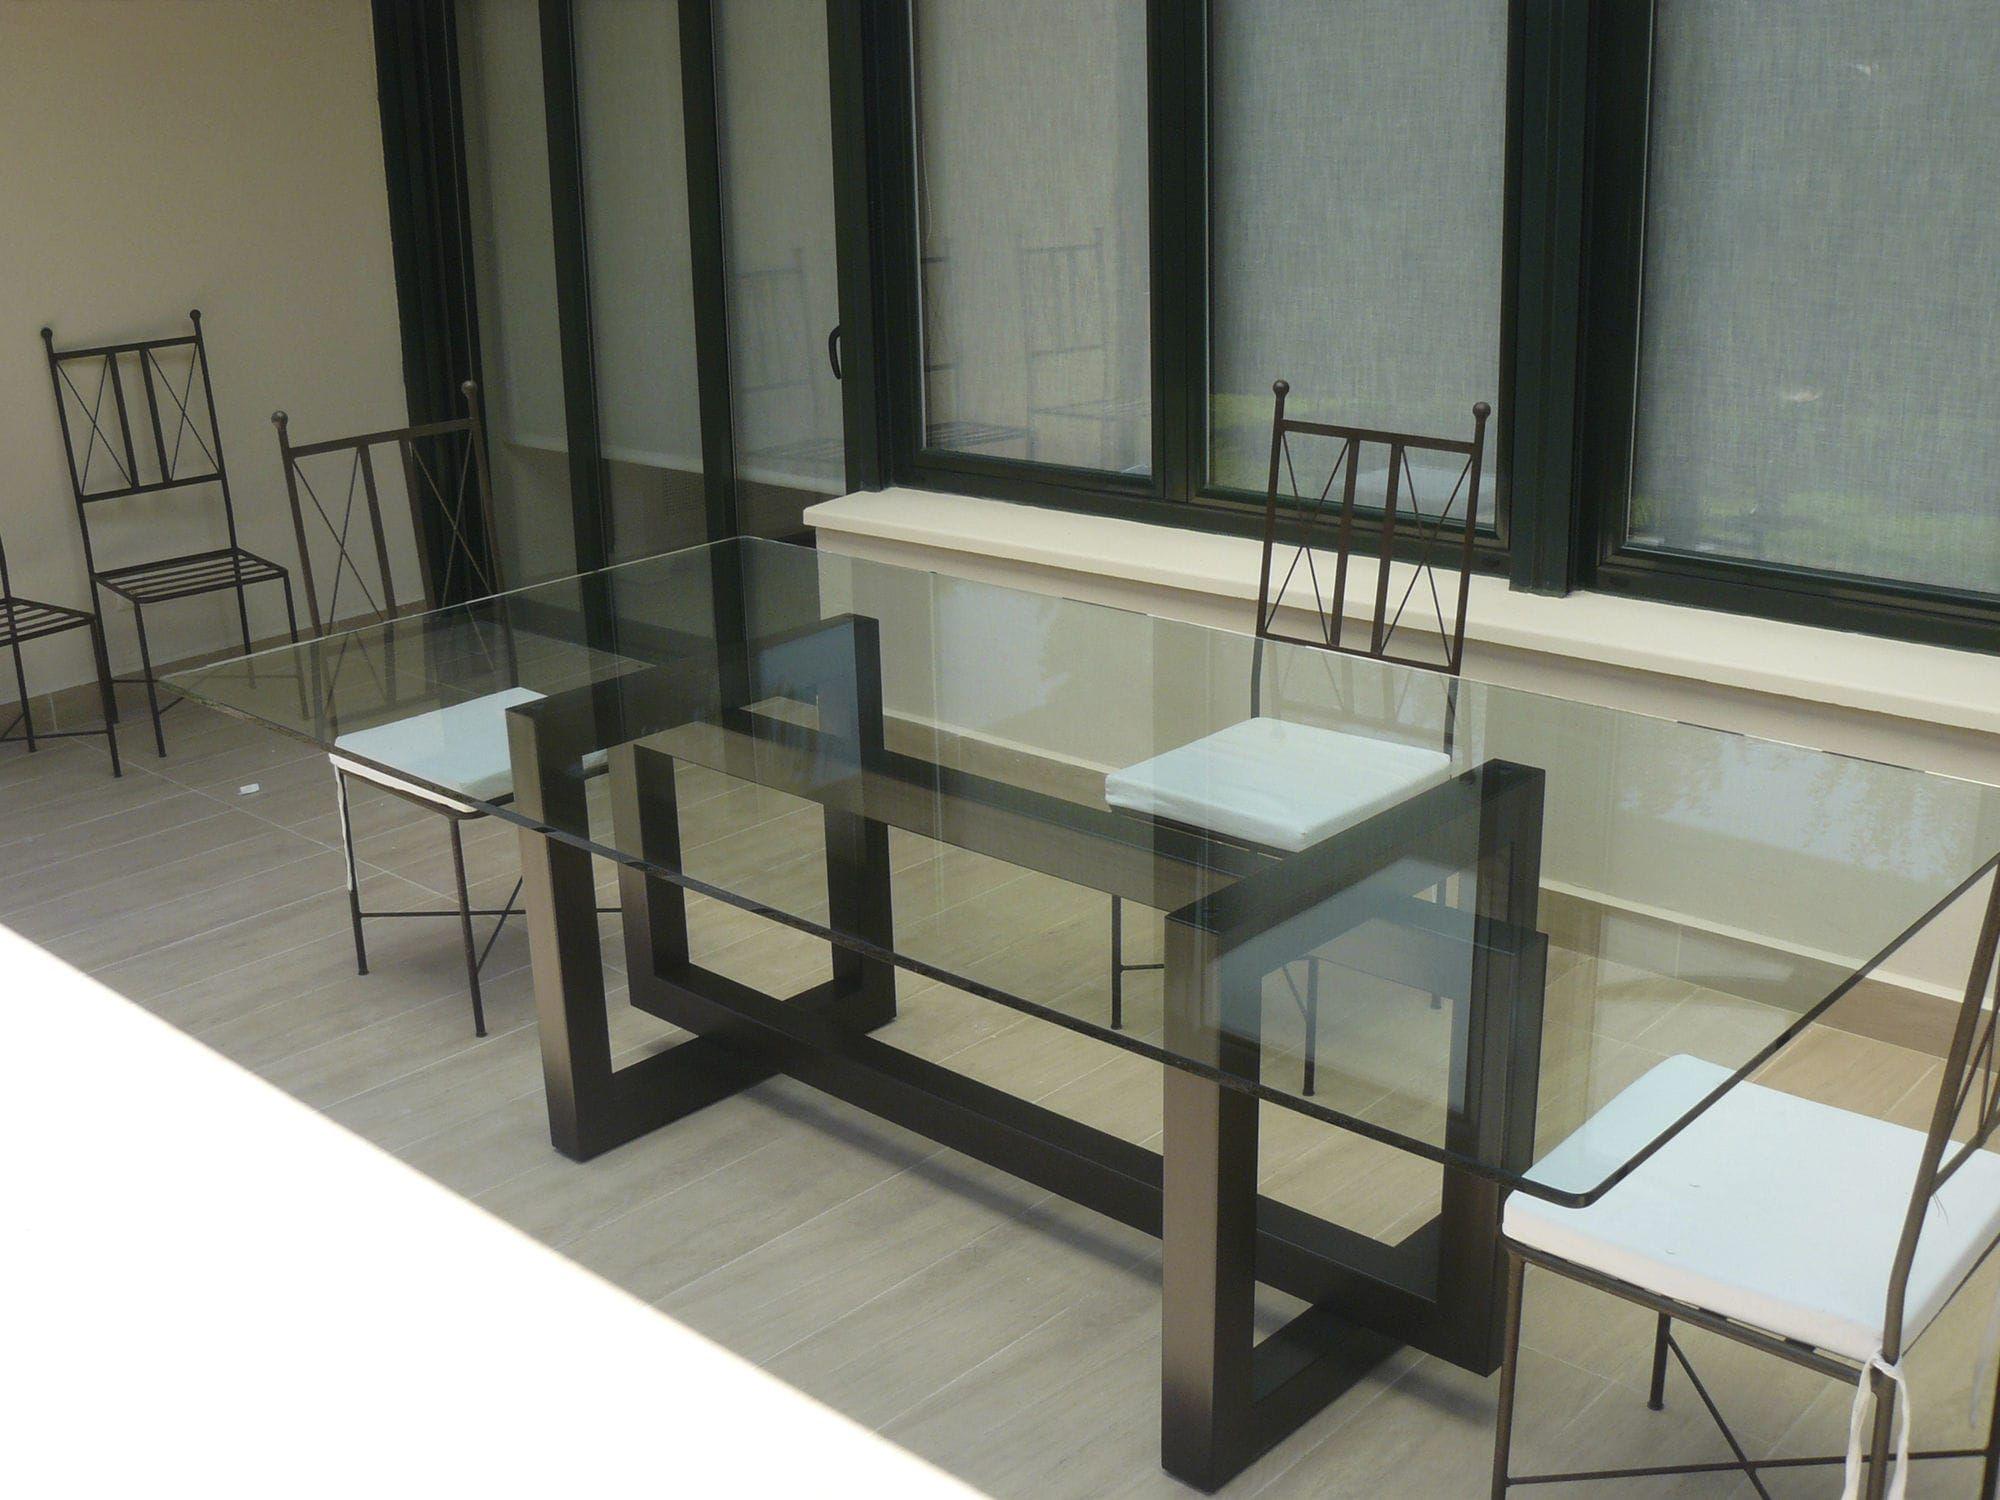 Mesa de comedor moderna de vidrio de acero inoxidable thasos gonzalo de salas mesita - Mesita de comedor ...